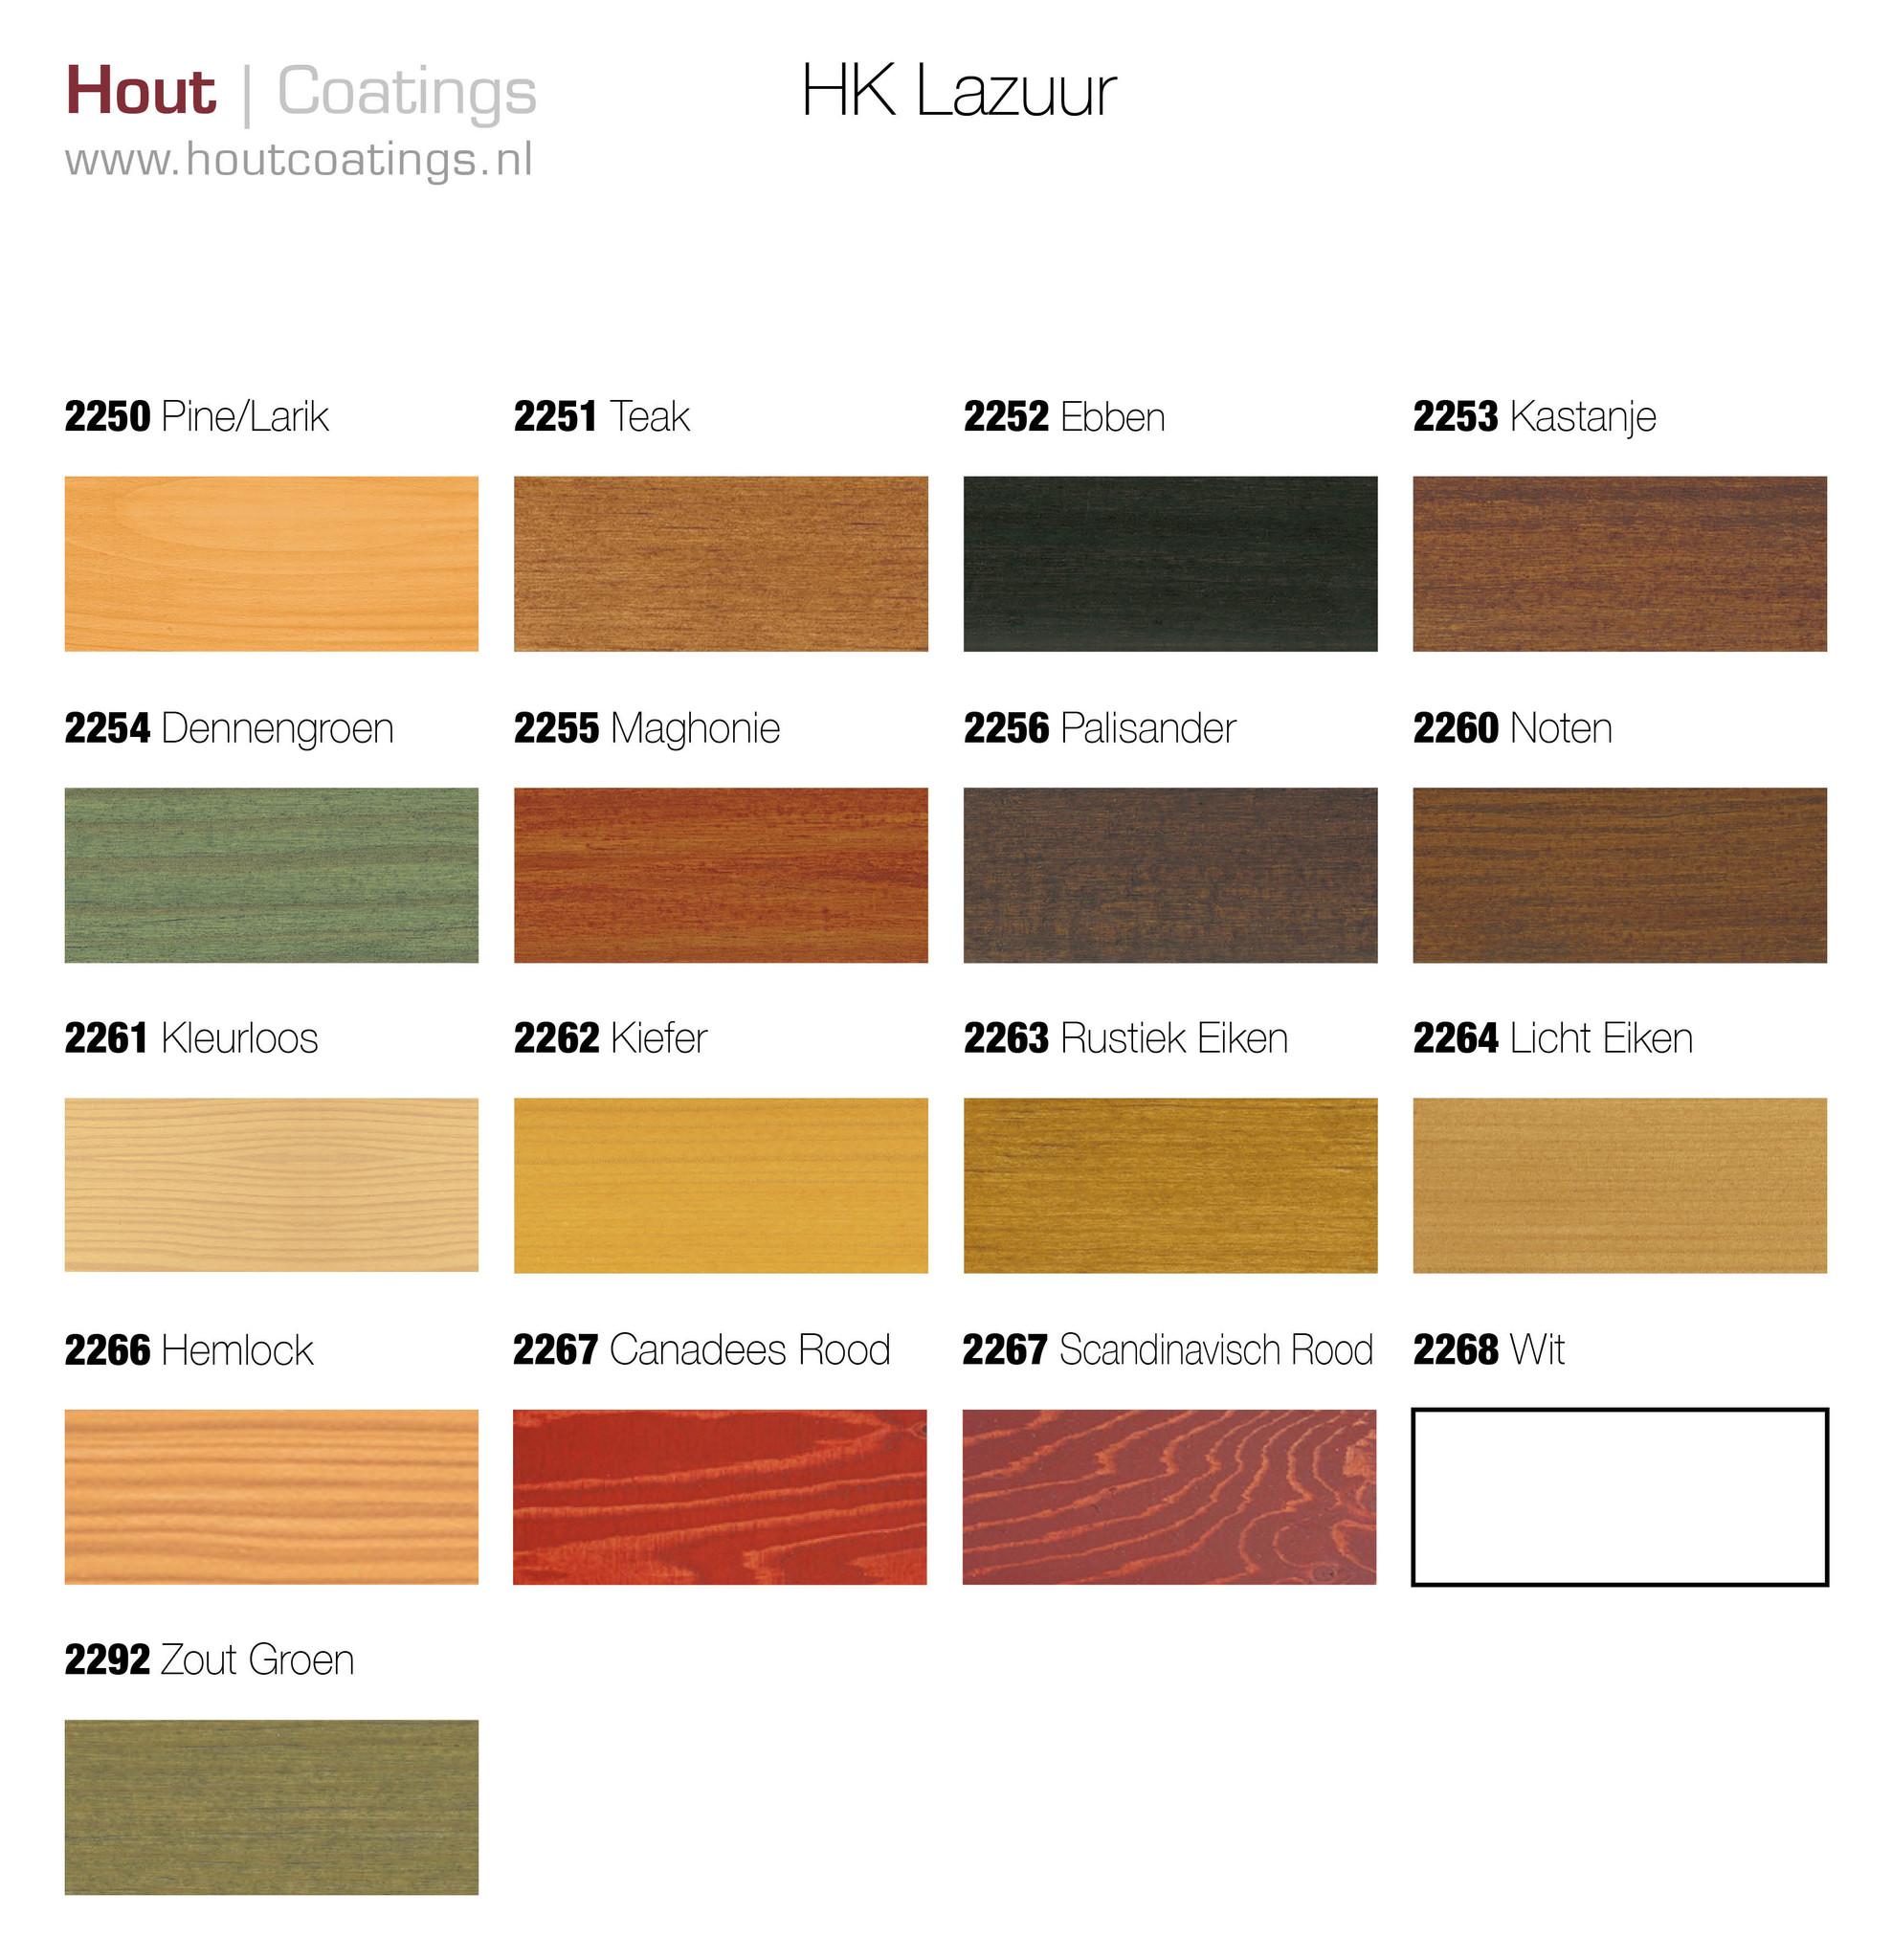 Remmers kleuren HK lazuur